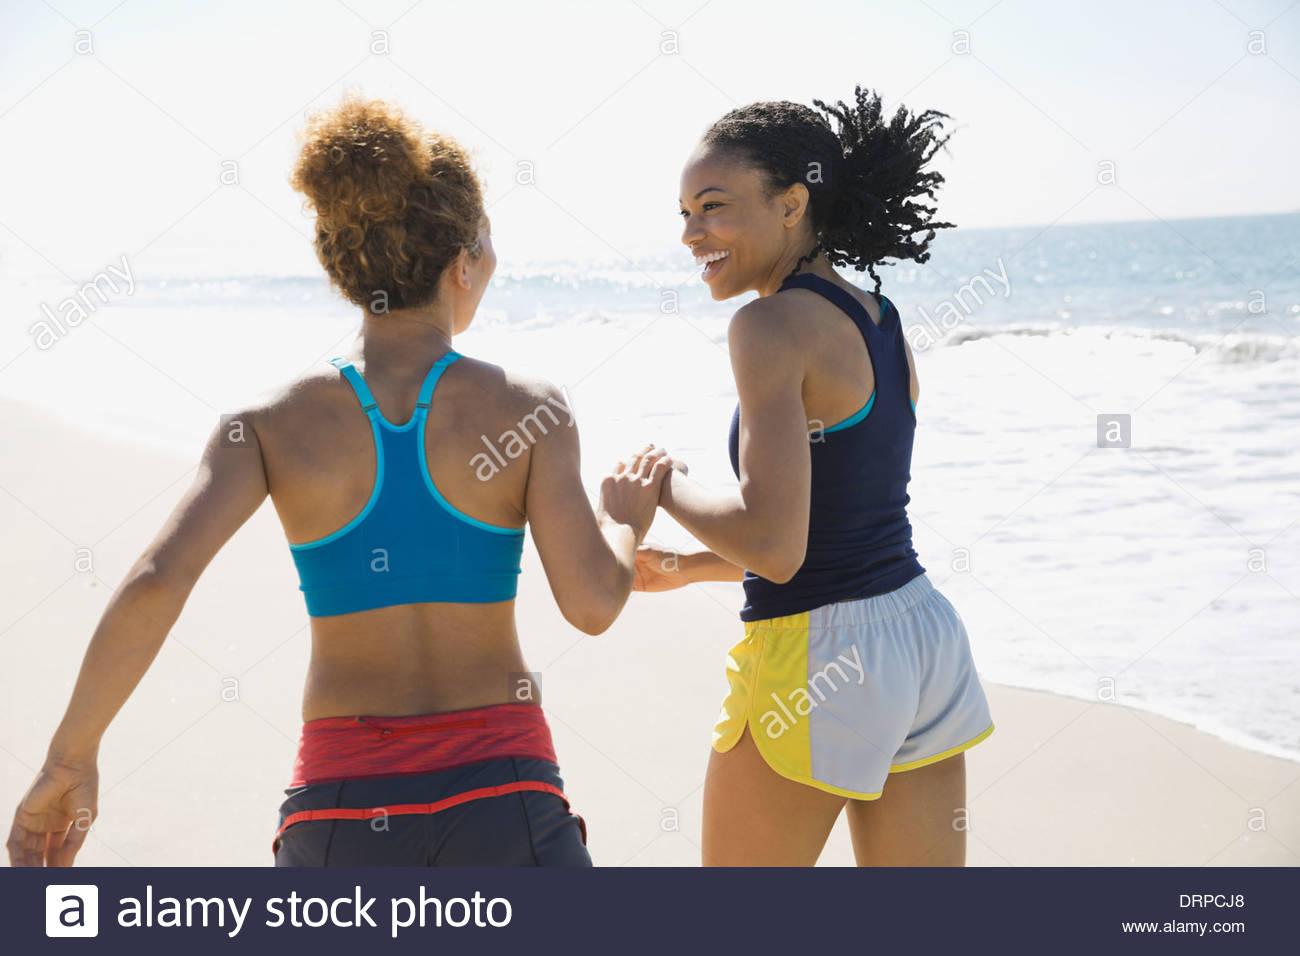 Female friends jogging on beach - Stock Image